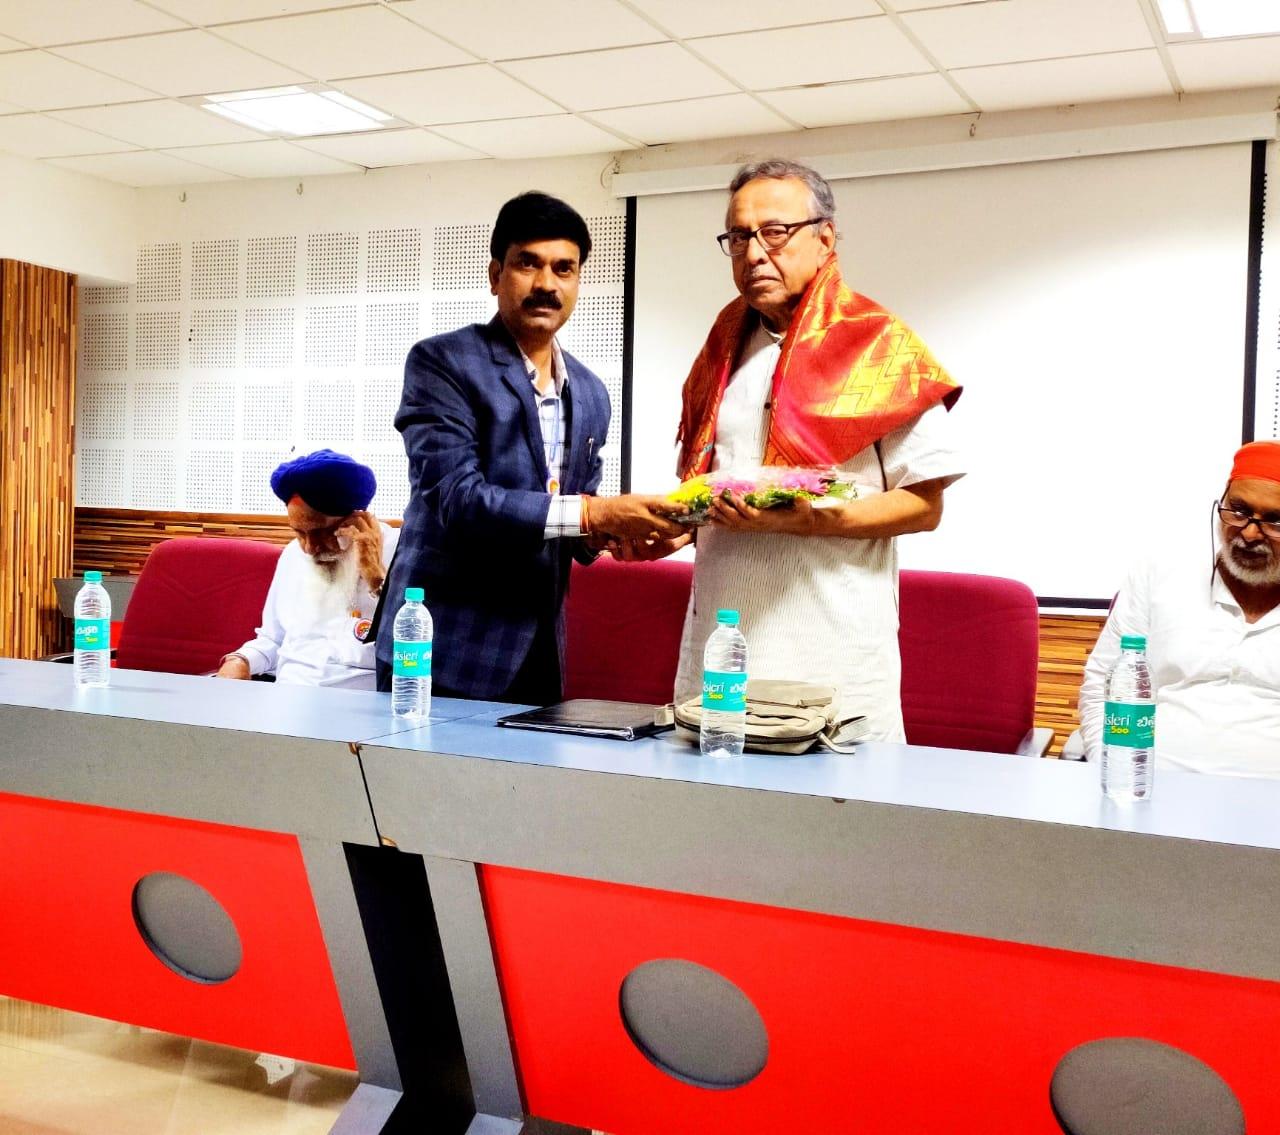 Guest lecturer on personality development by Mr. Aravind Jatti President, Antharastriya Basava Samithi organised by ECE department